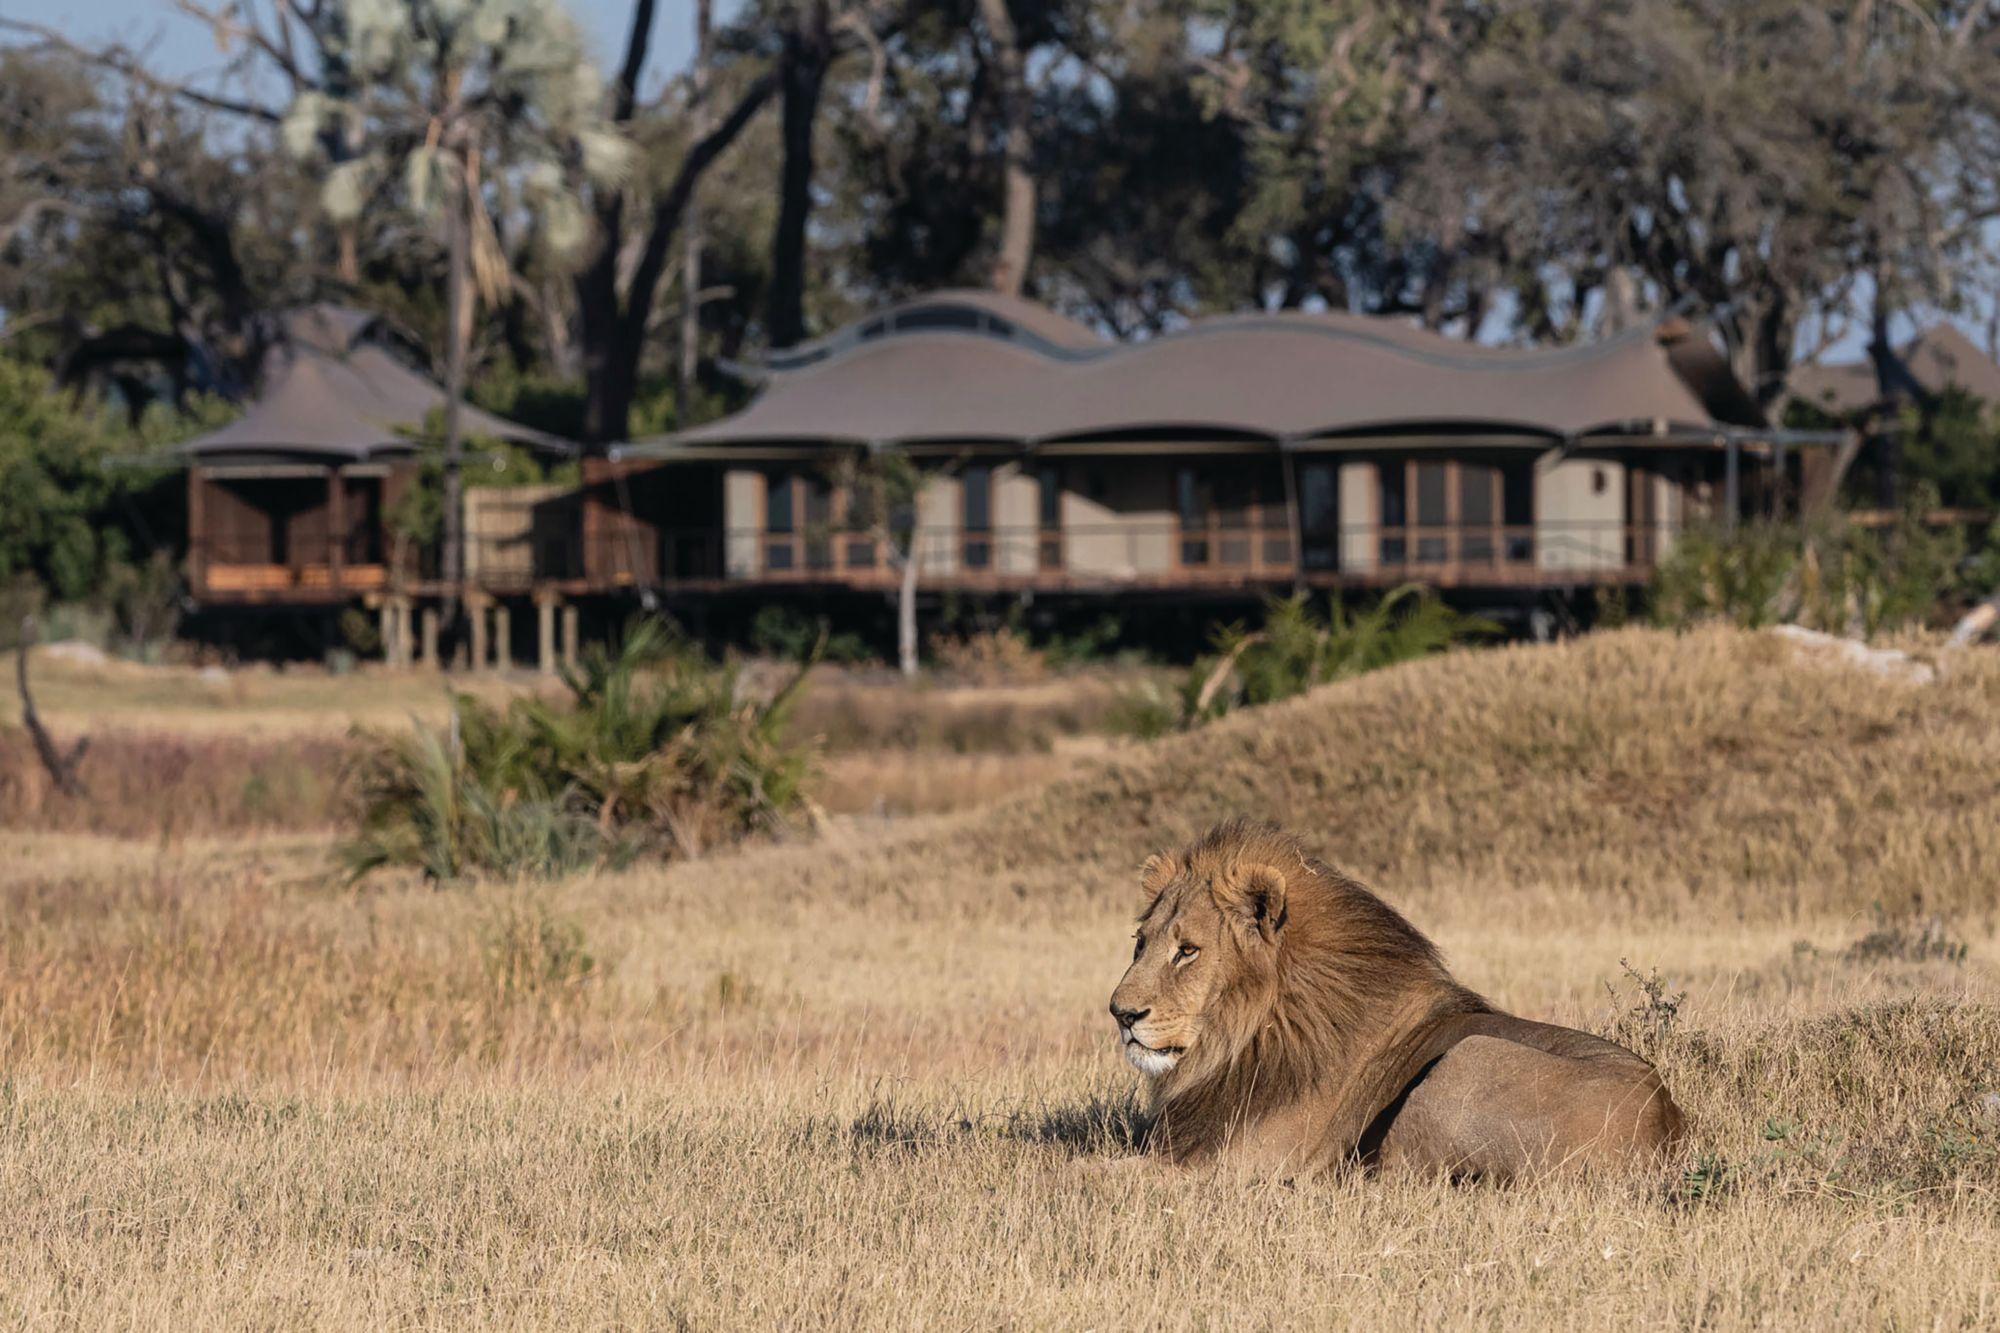 A Look at Xigera Safari Lodge, Botswana's New Solar-Powered and Art-Filled Hotel